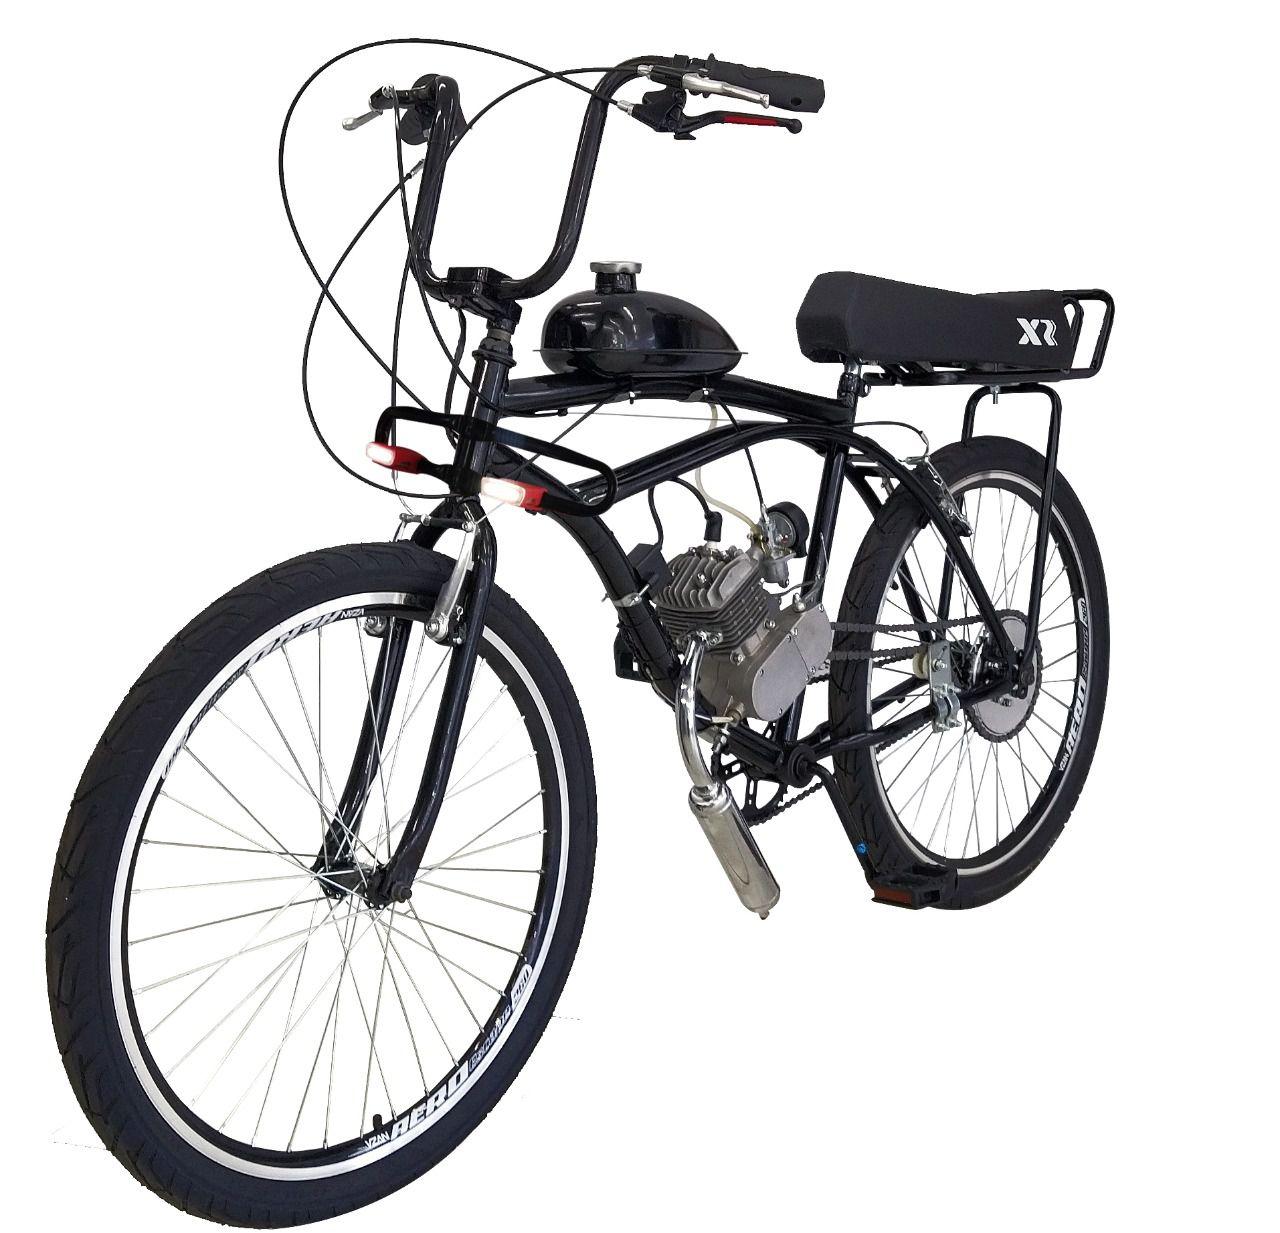 Suporte para Farol  Bicicletas Motorizadas